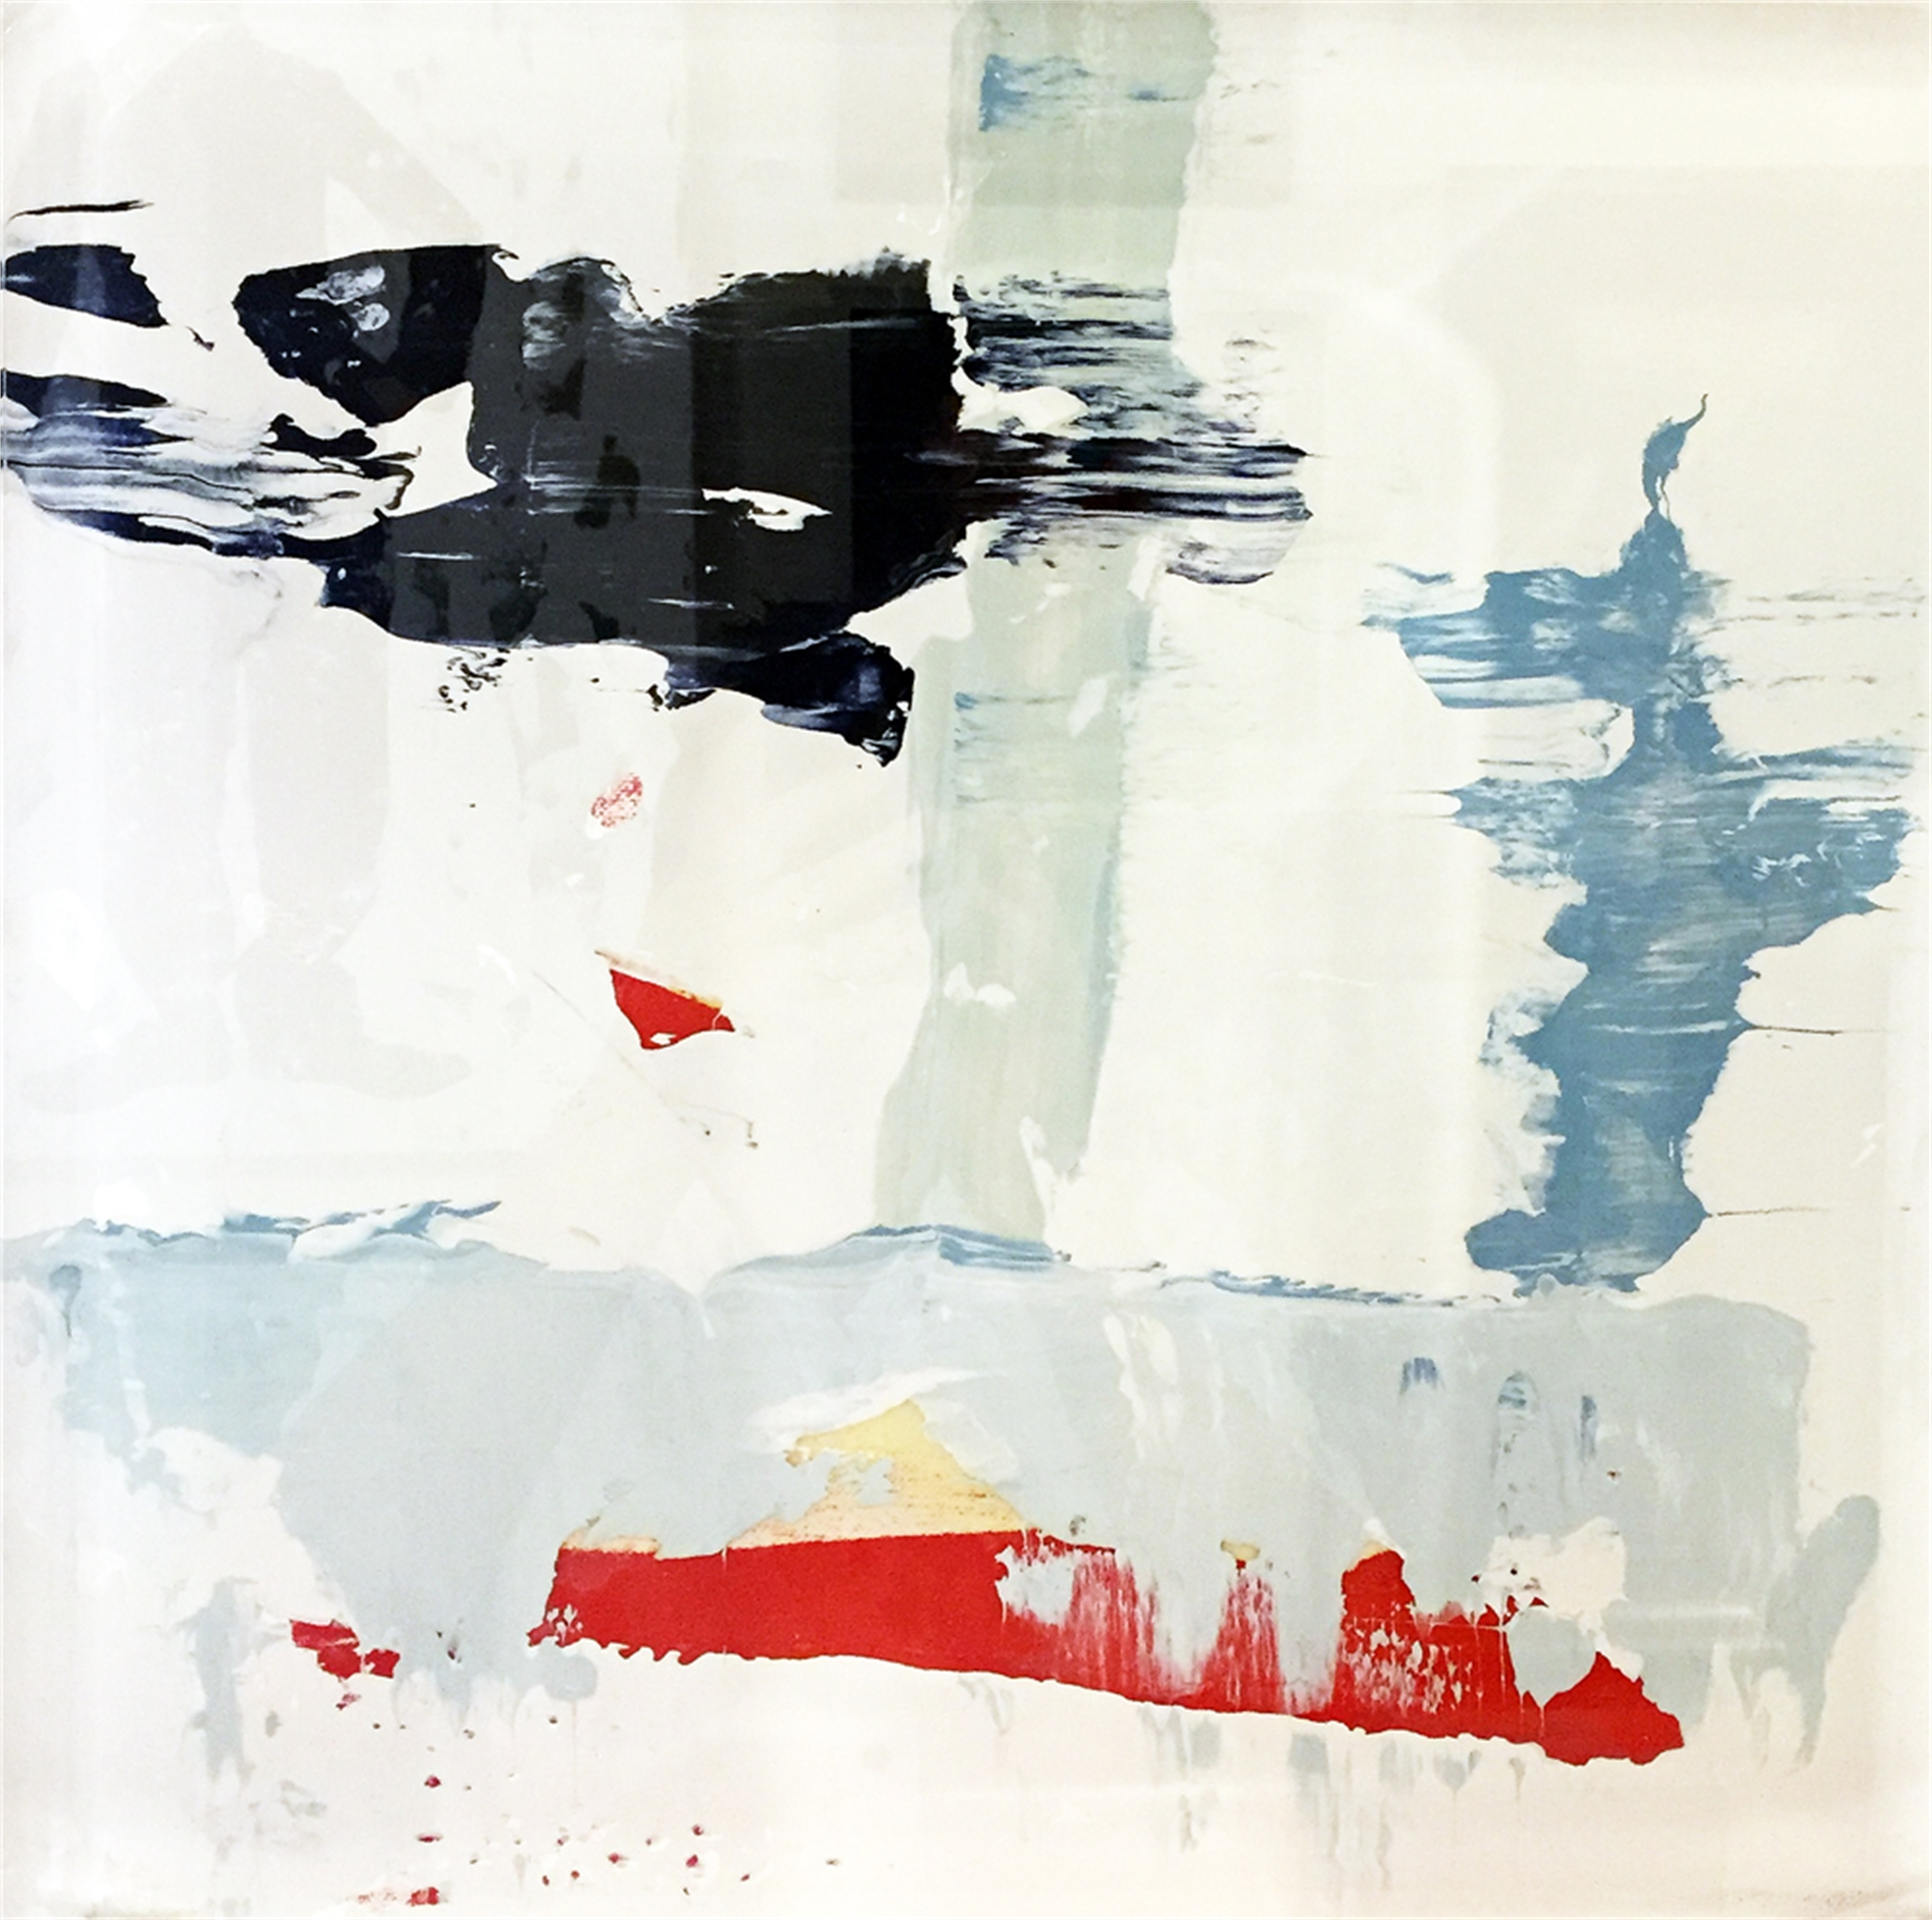 Vetro IV by John Schuyler